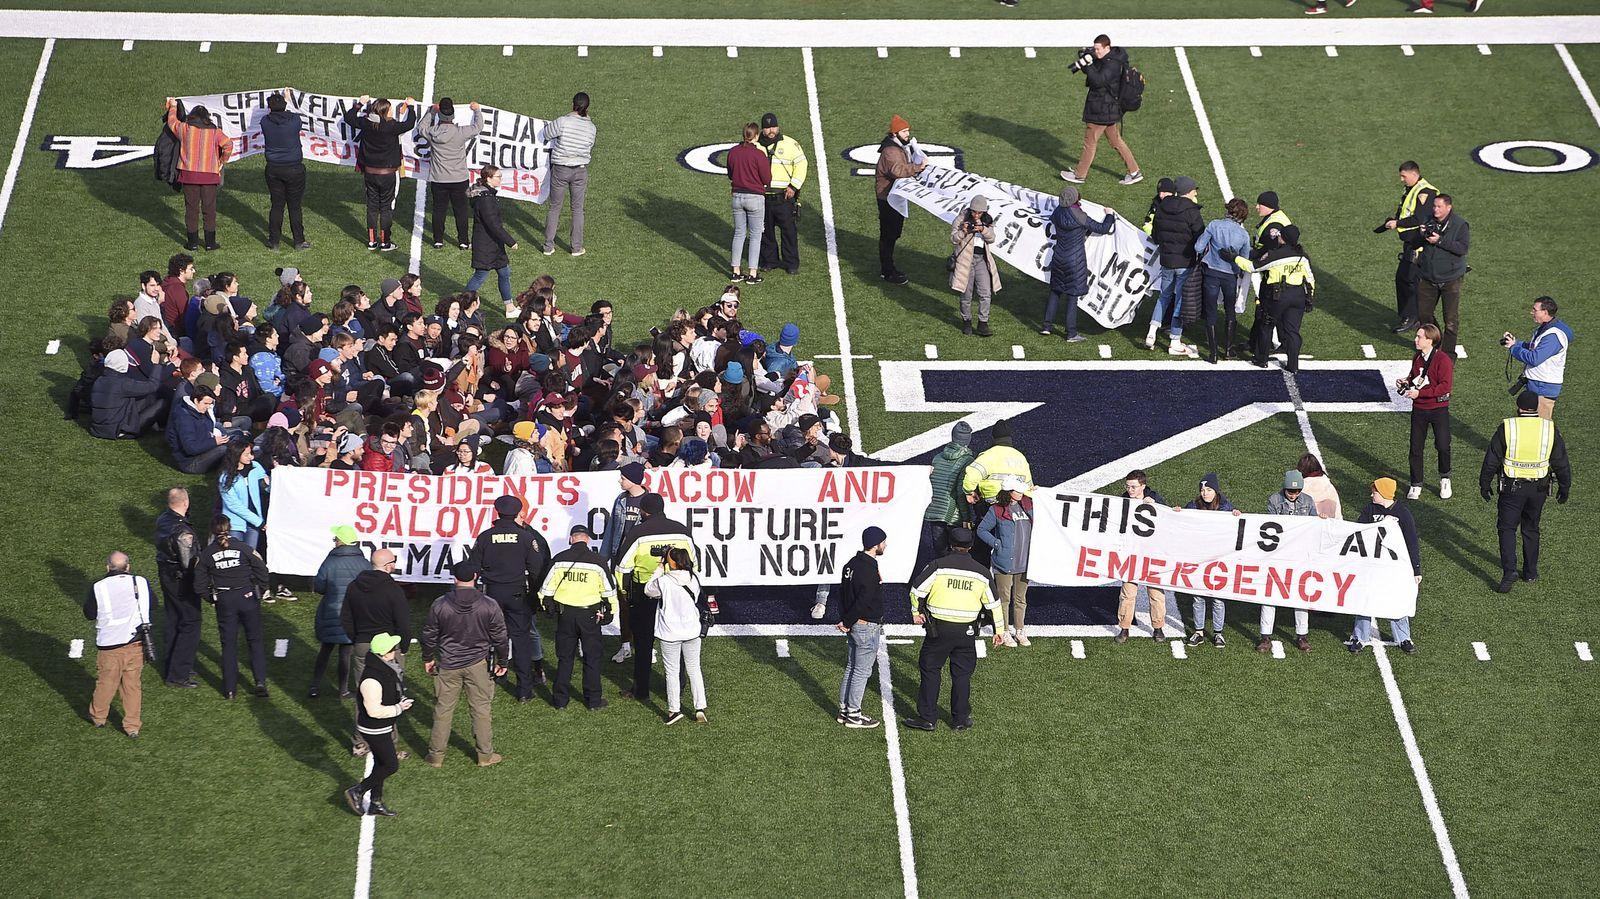 Harvard/ Yale/ Protest/ Football